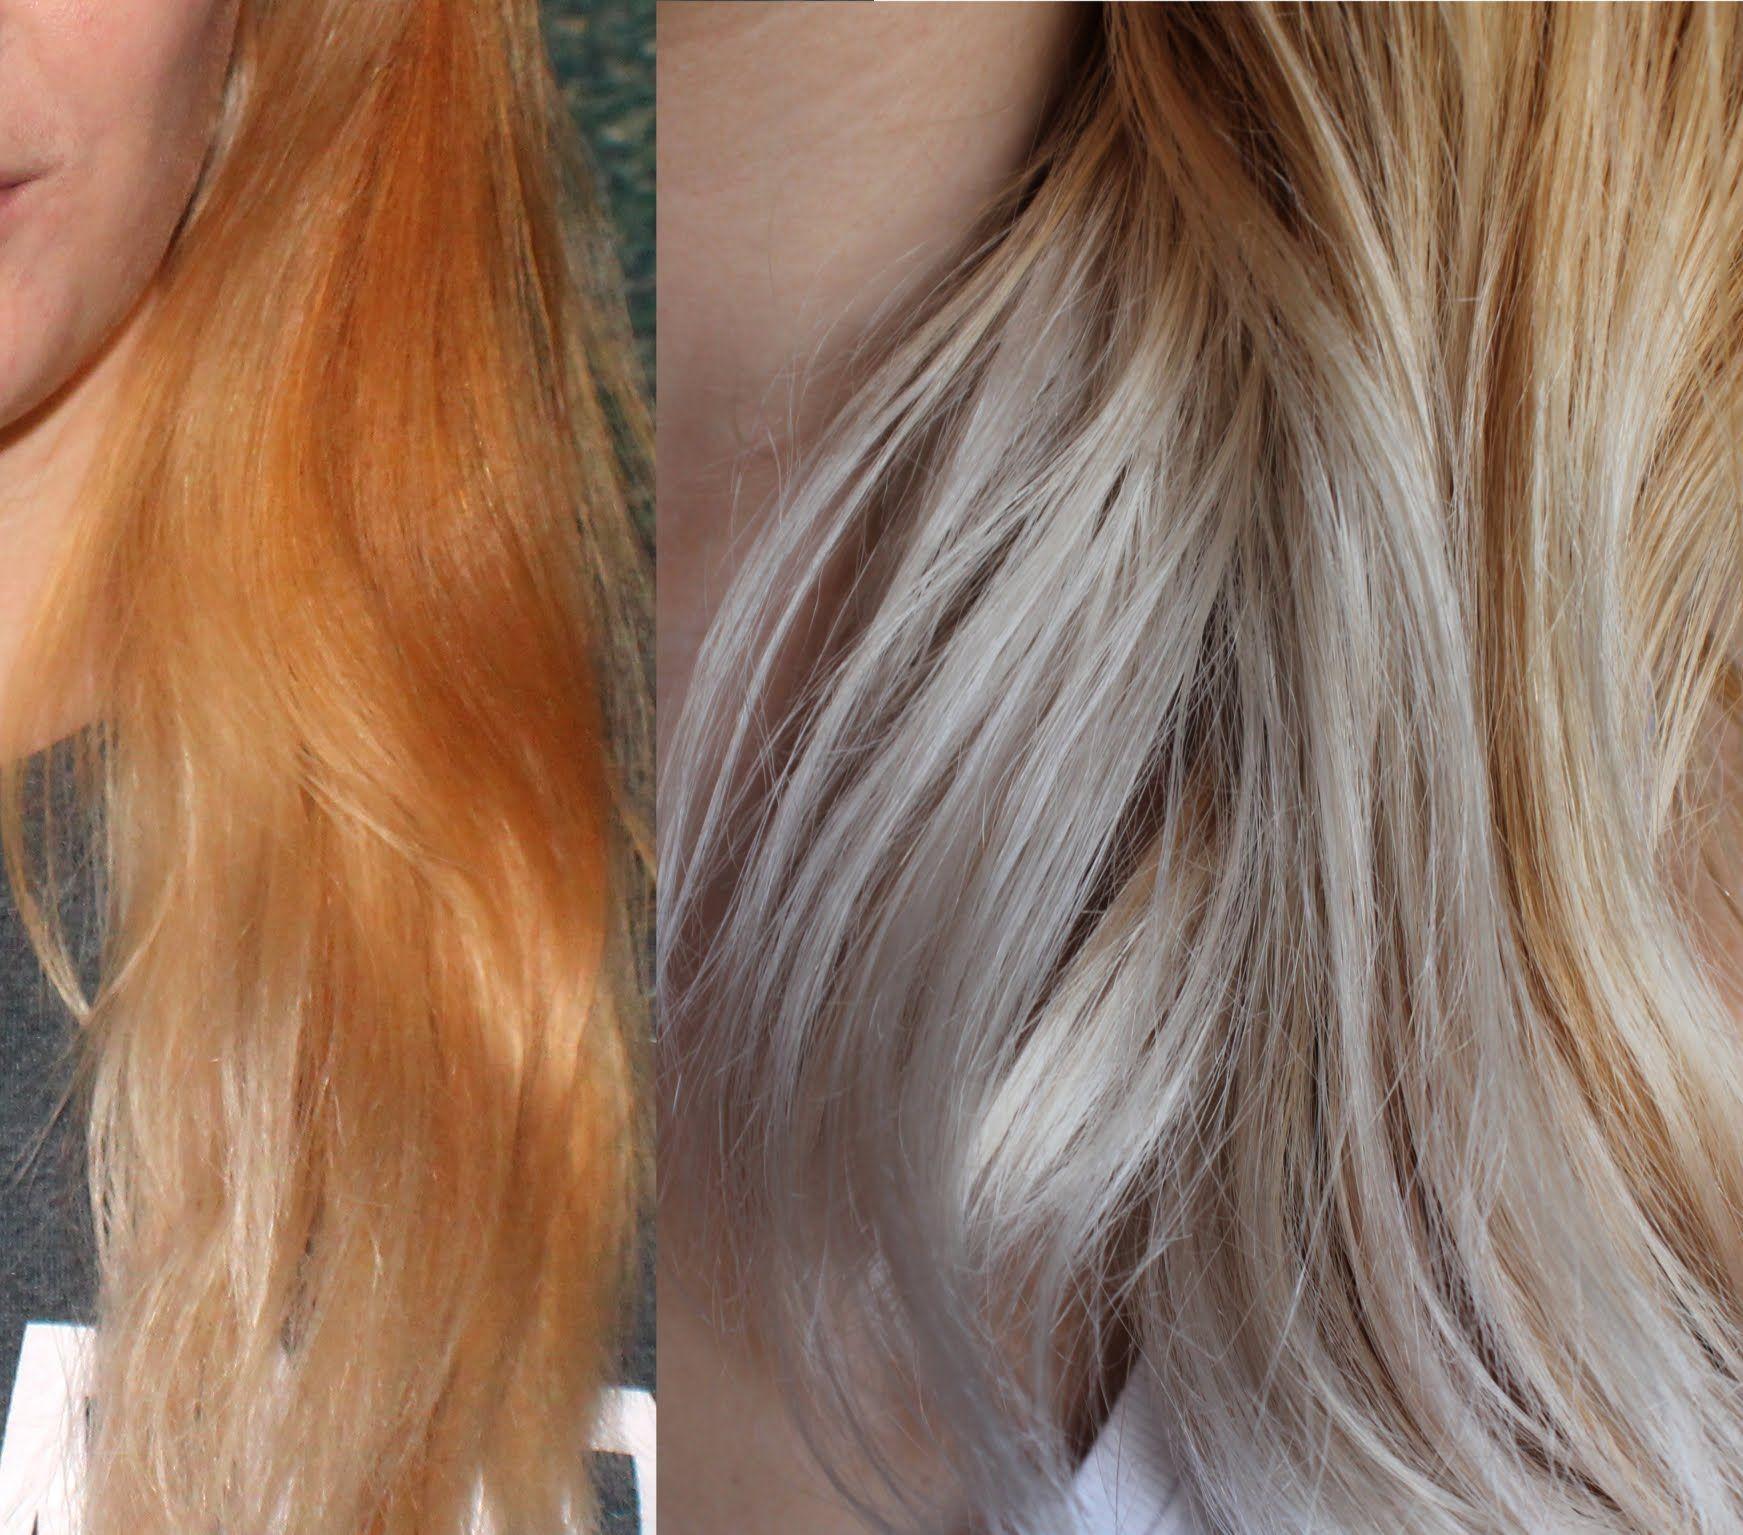 Diy Hair How To Use Wella Color Charm Toner Toning Blonde Hair Toner For Blonde Hair Toning Bleached Hair